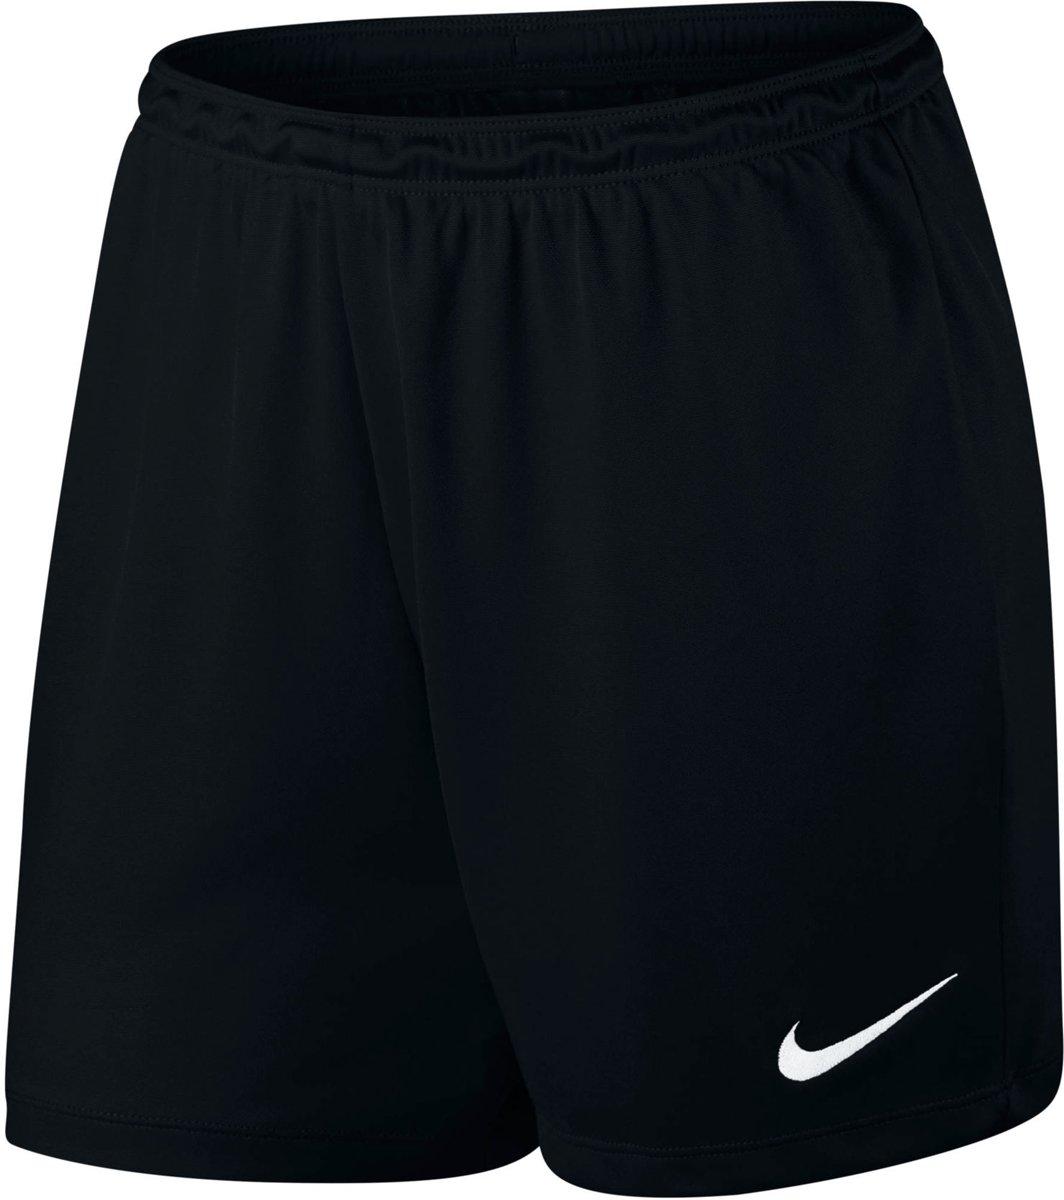 091ac7e2c0b Womens Dry Park II Short Nb K Sportshort Dames - Black/White · Nike